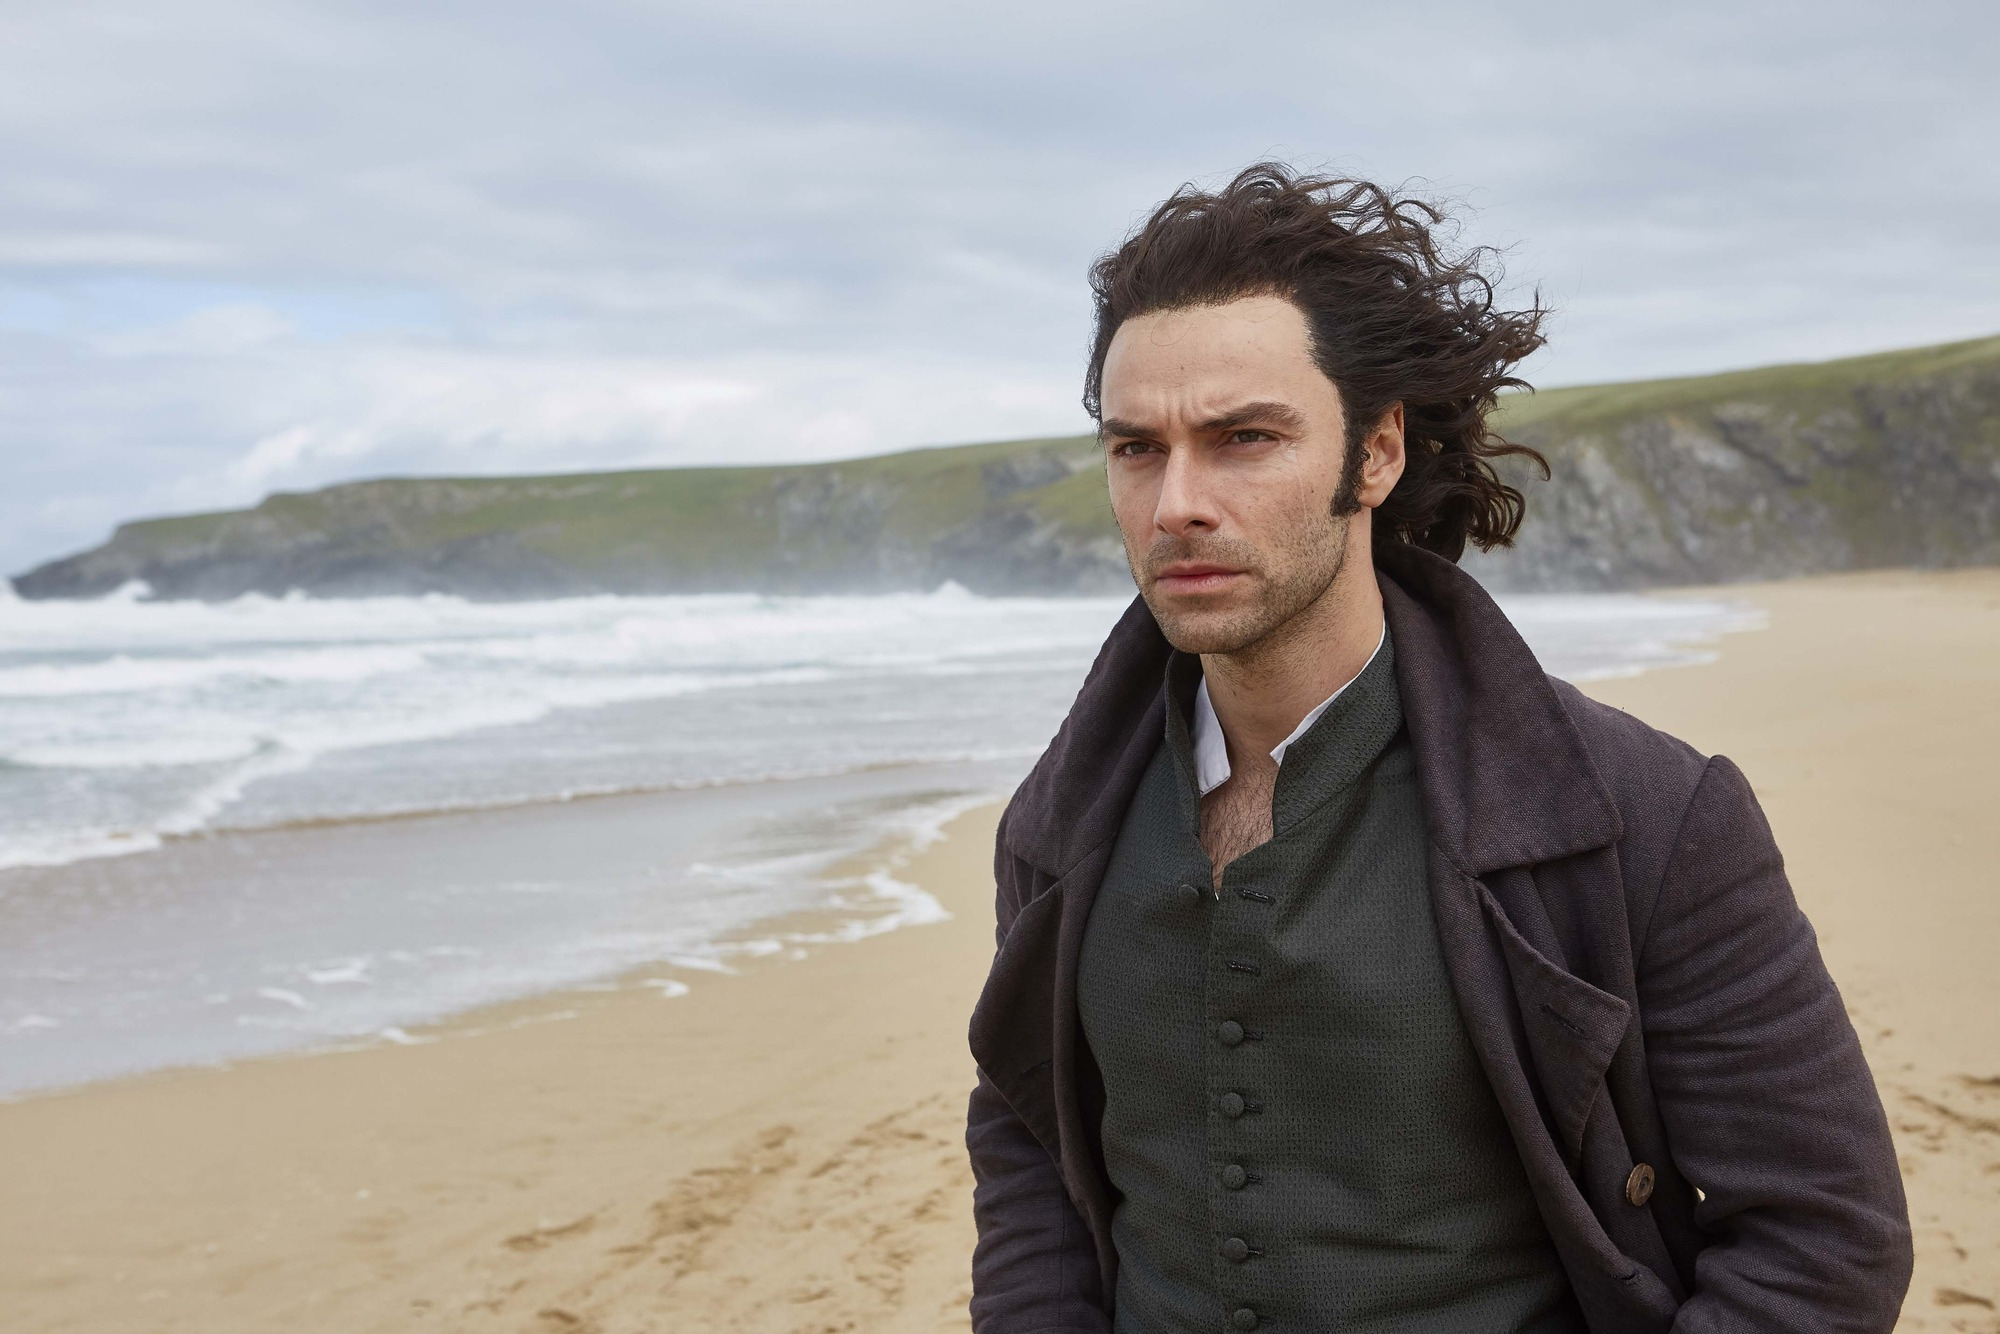 The actor Aidan Turner, playing Poldark on a windswept beach